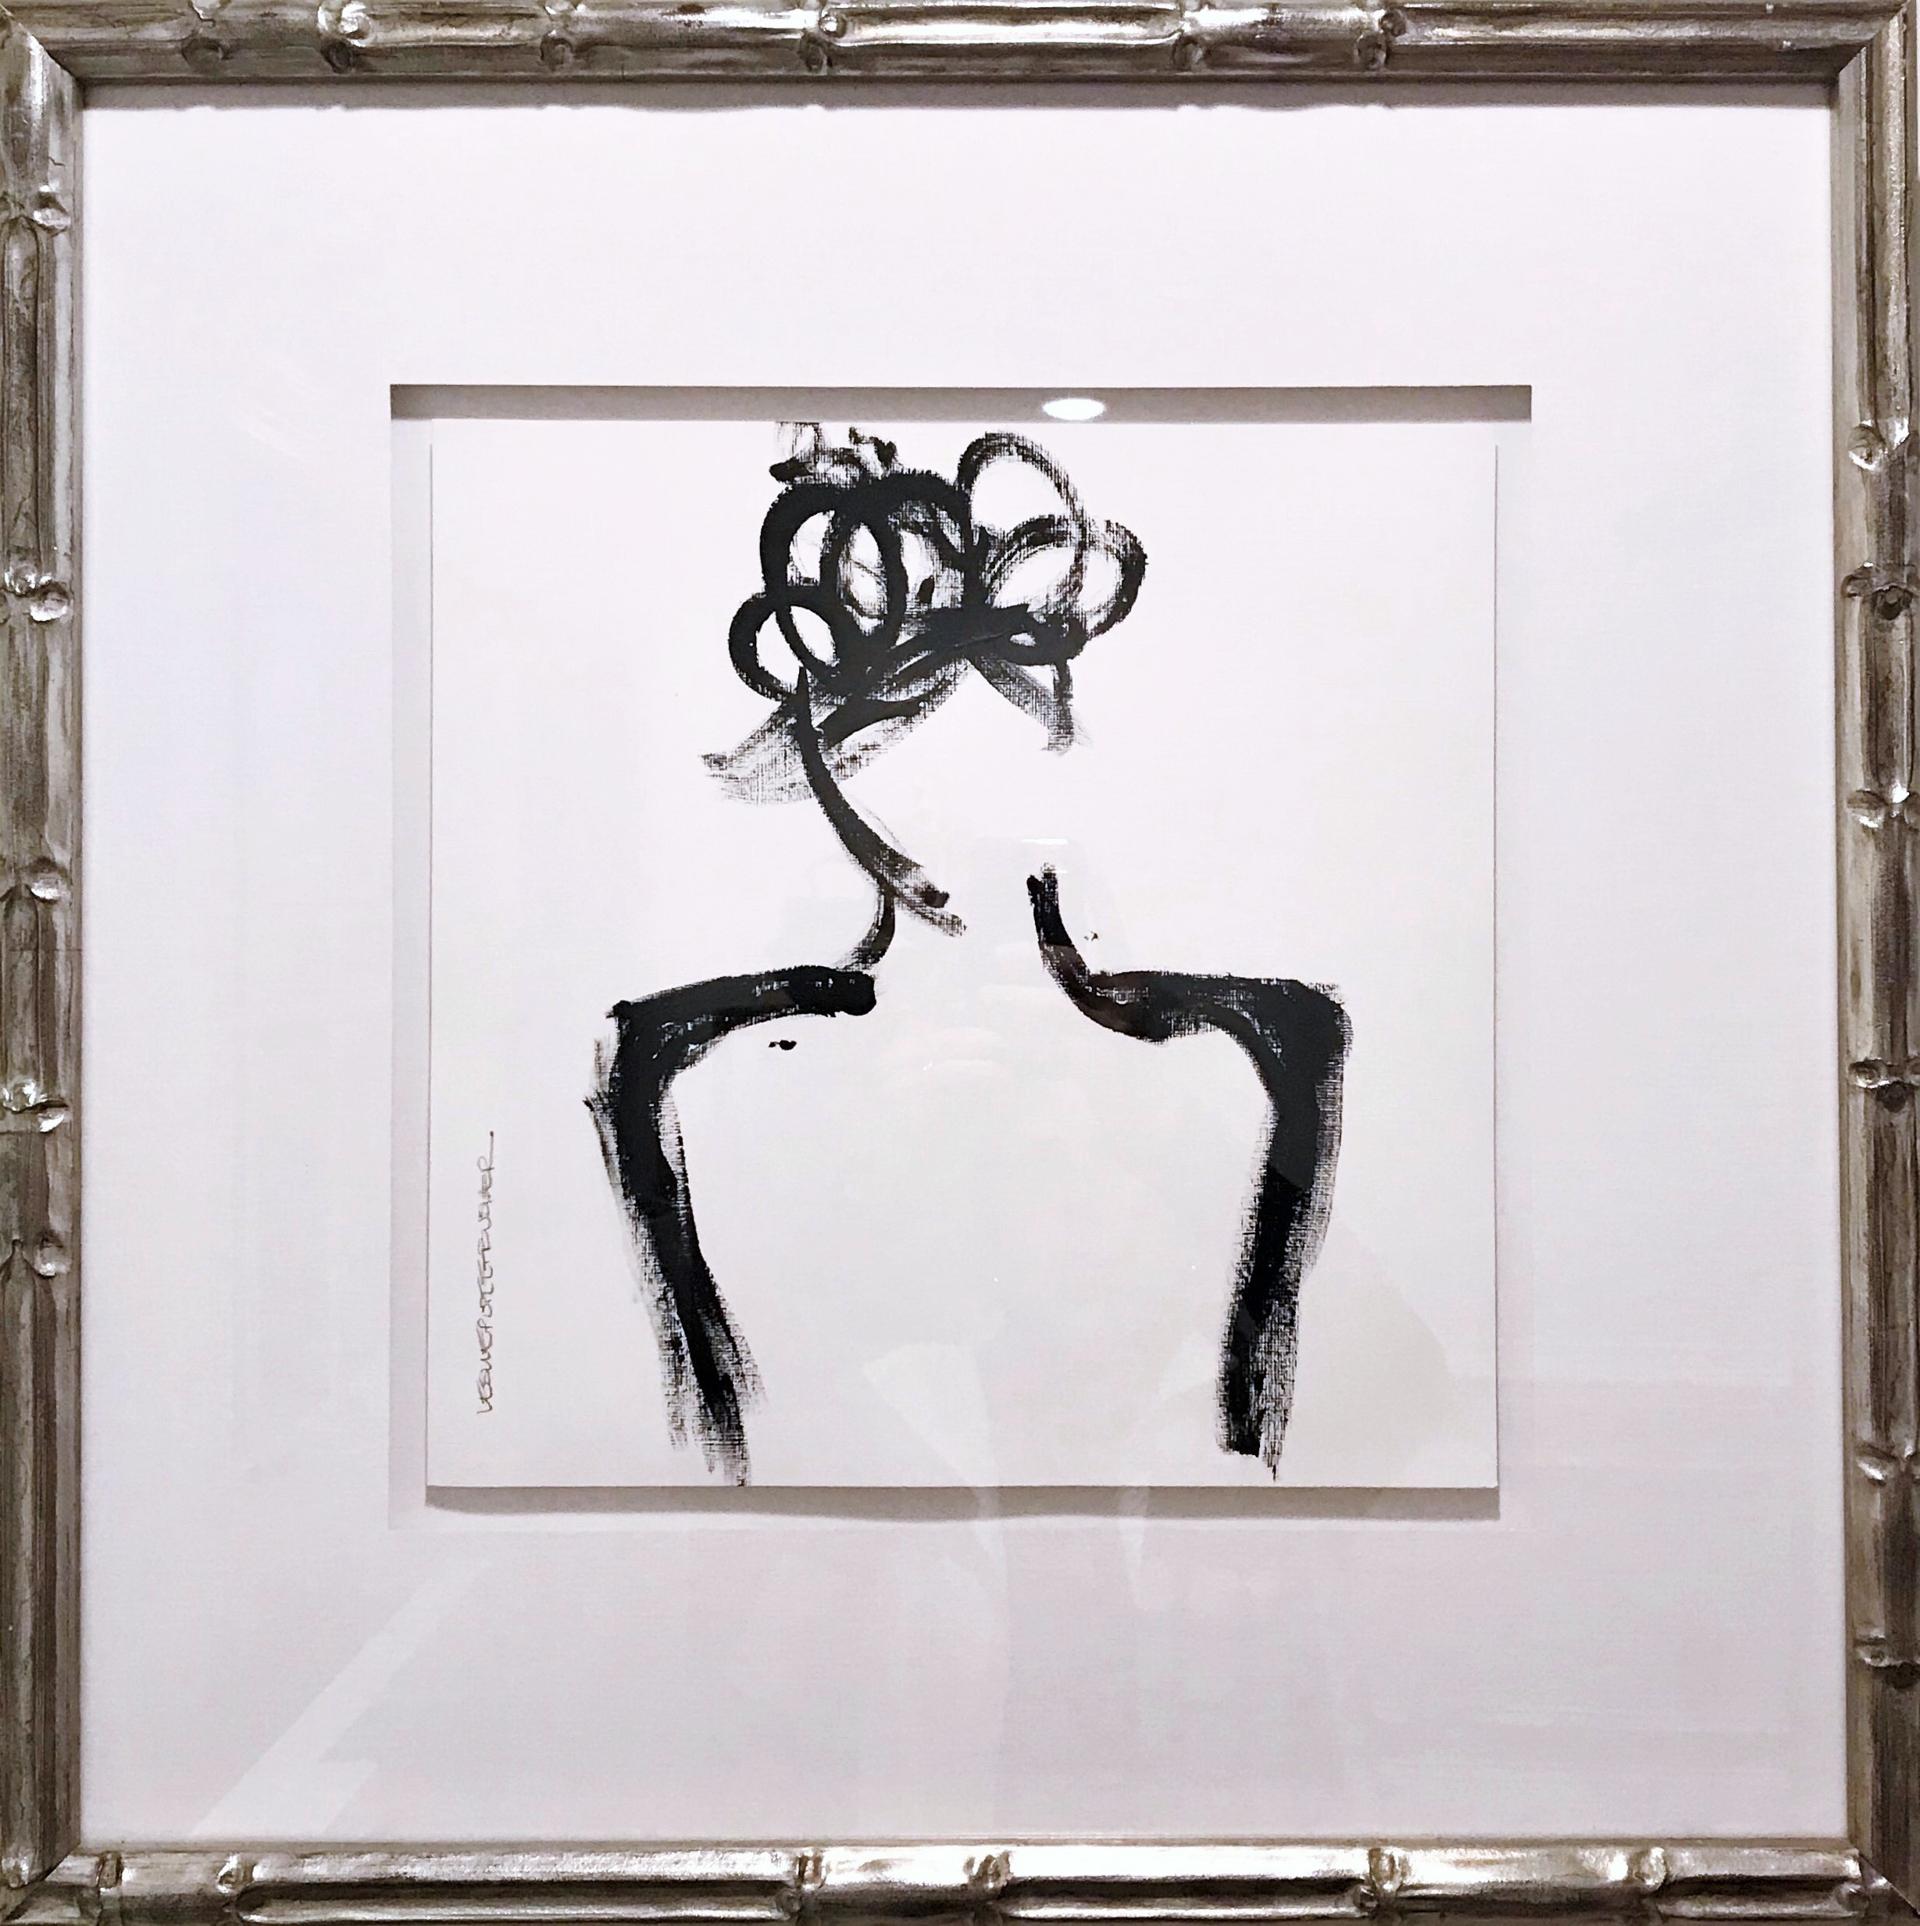 Figure No. 180 by Leslie Poteet Busker